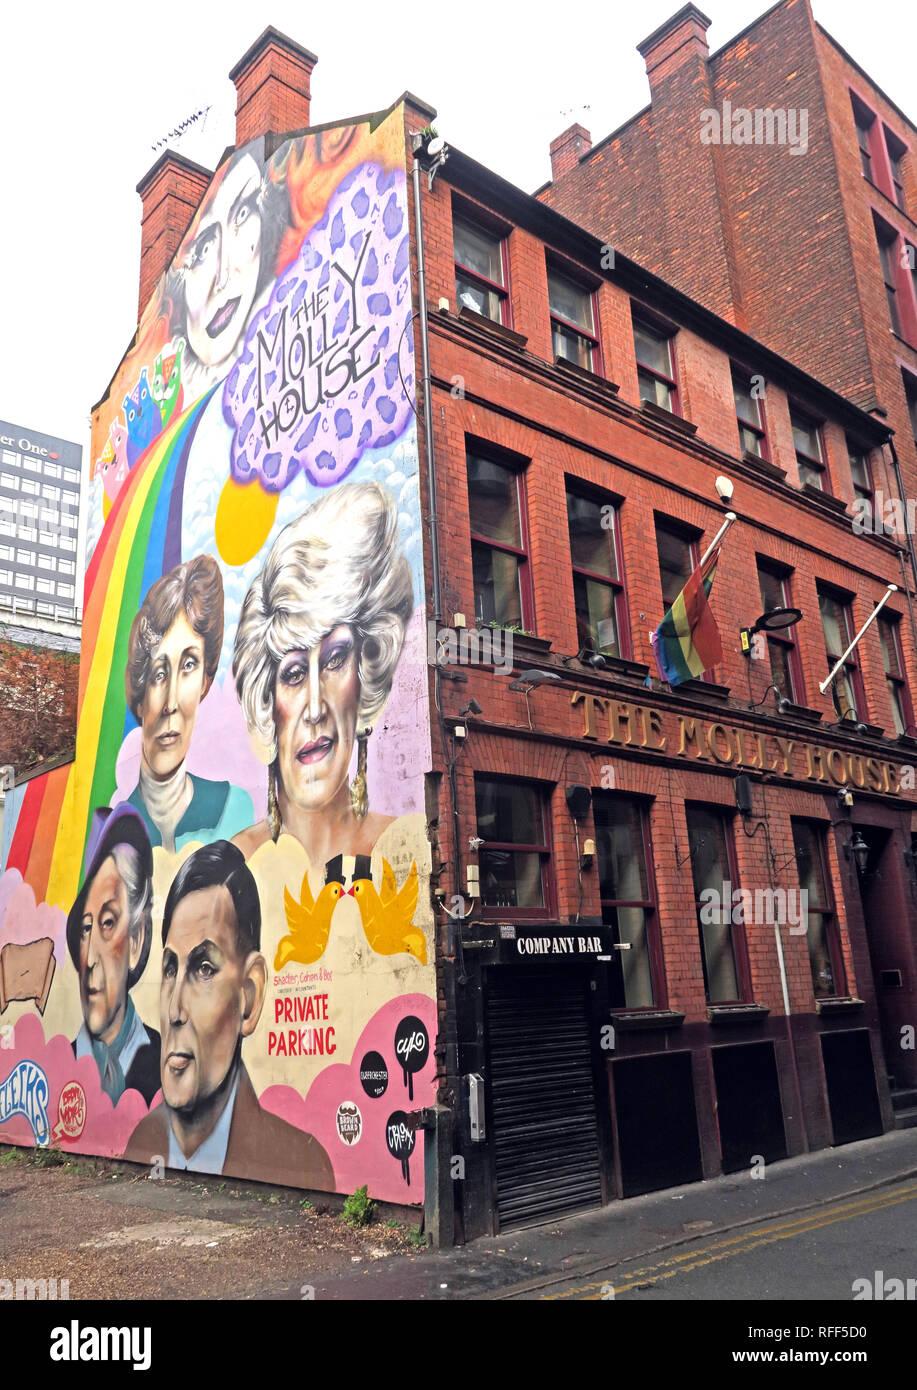 Manchester,city,@HotpixUK,HotpixUK,GoTonySmith,North